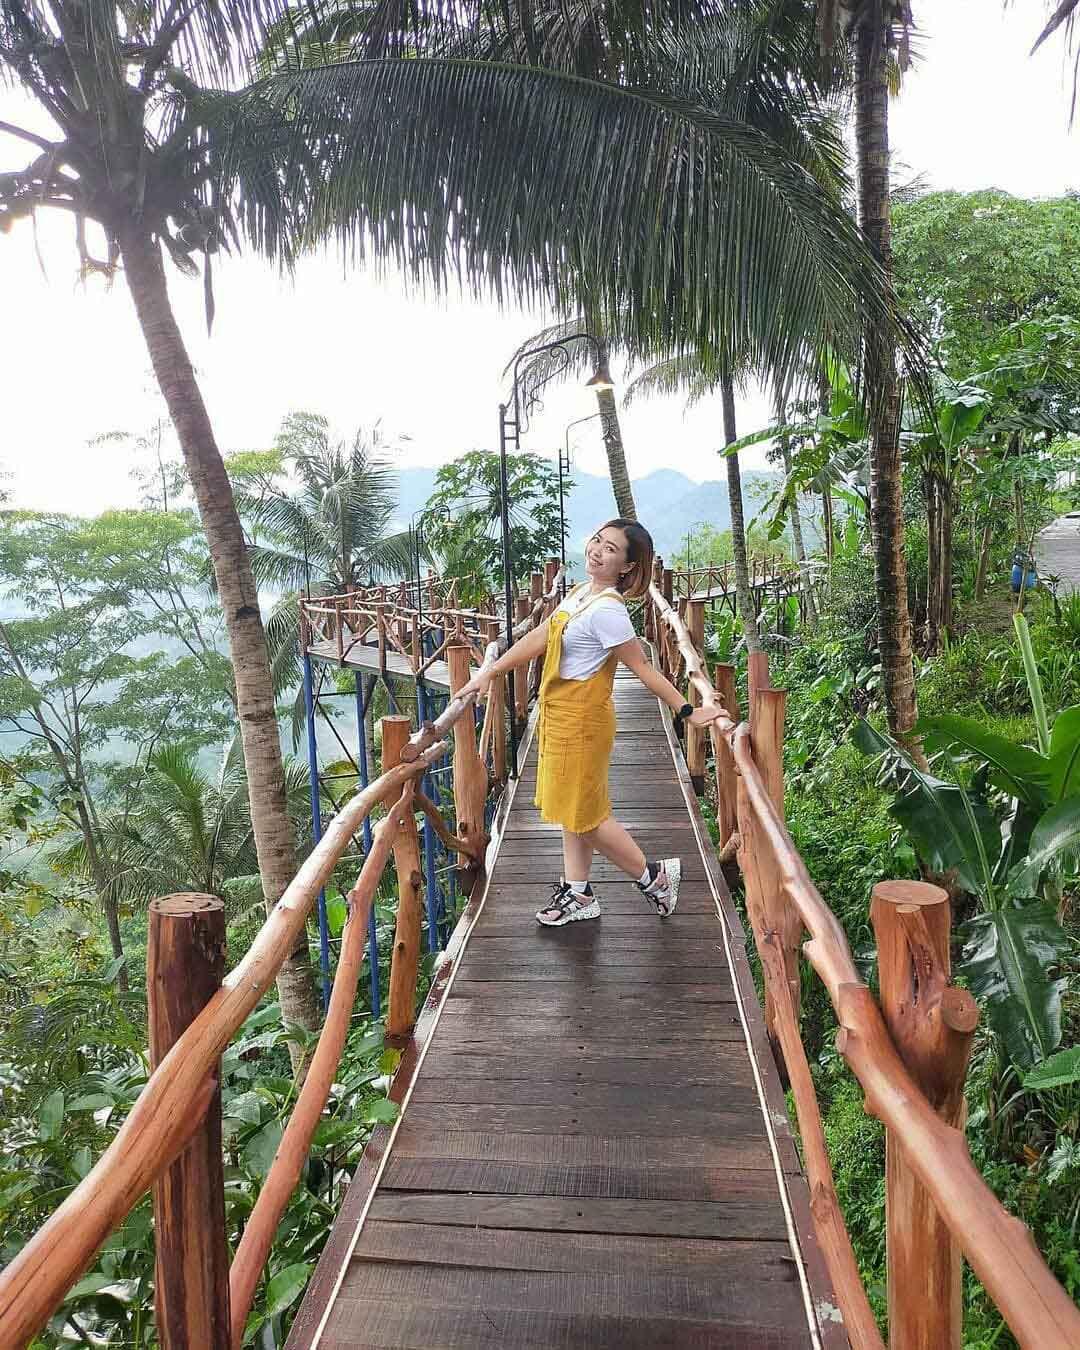 Jembatan Di Bukit Wisata Pulepayung Kulonprogo Image From @vhe_mel_azzahra